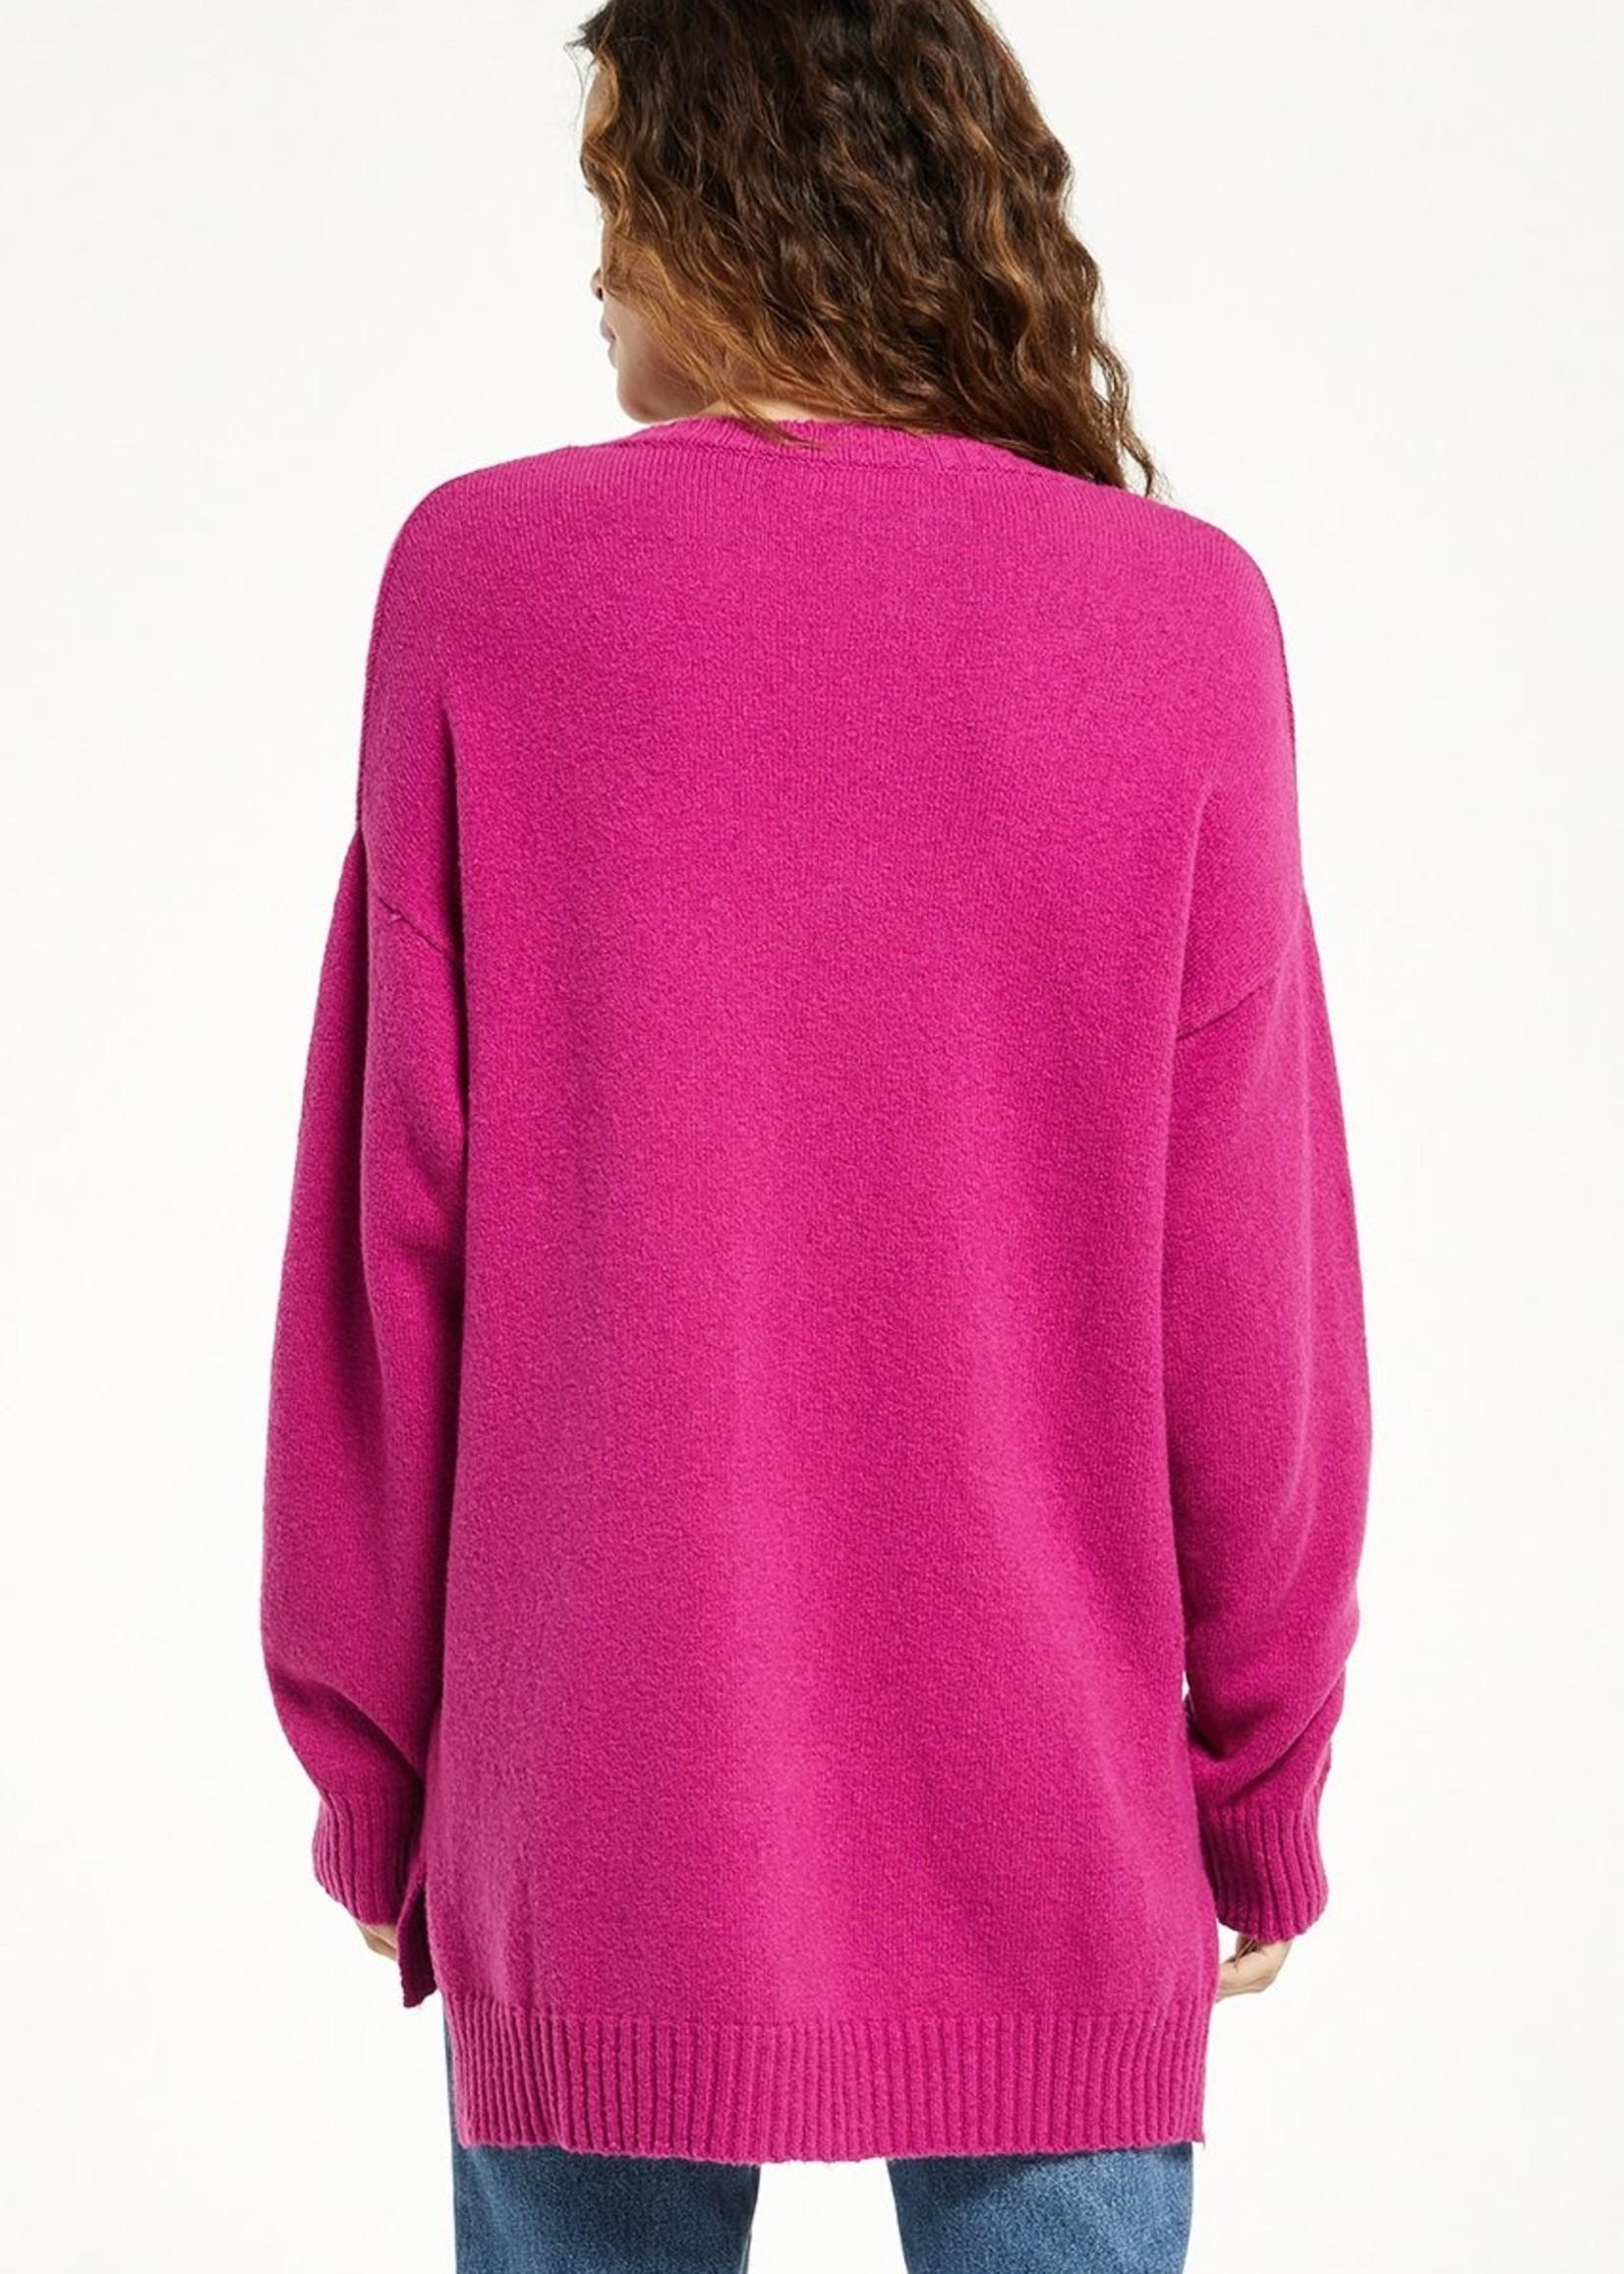 Z Supply Z Supply Autumn V-Neck Sweater